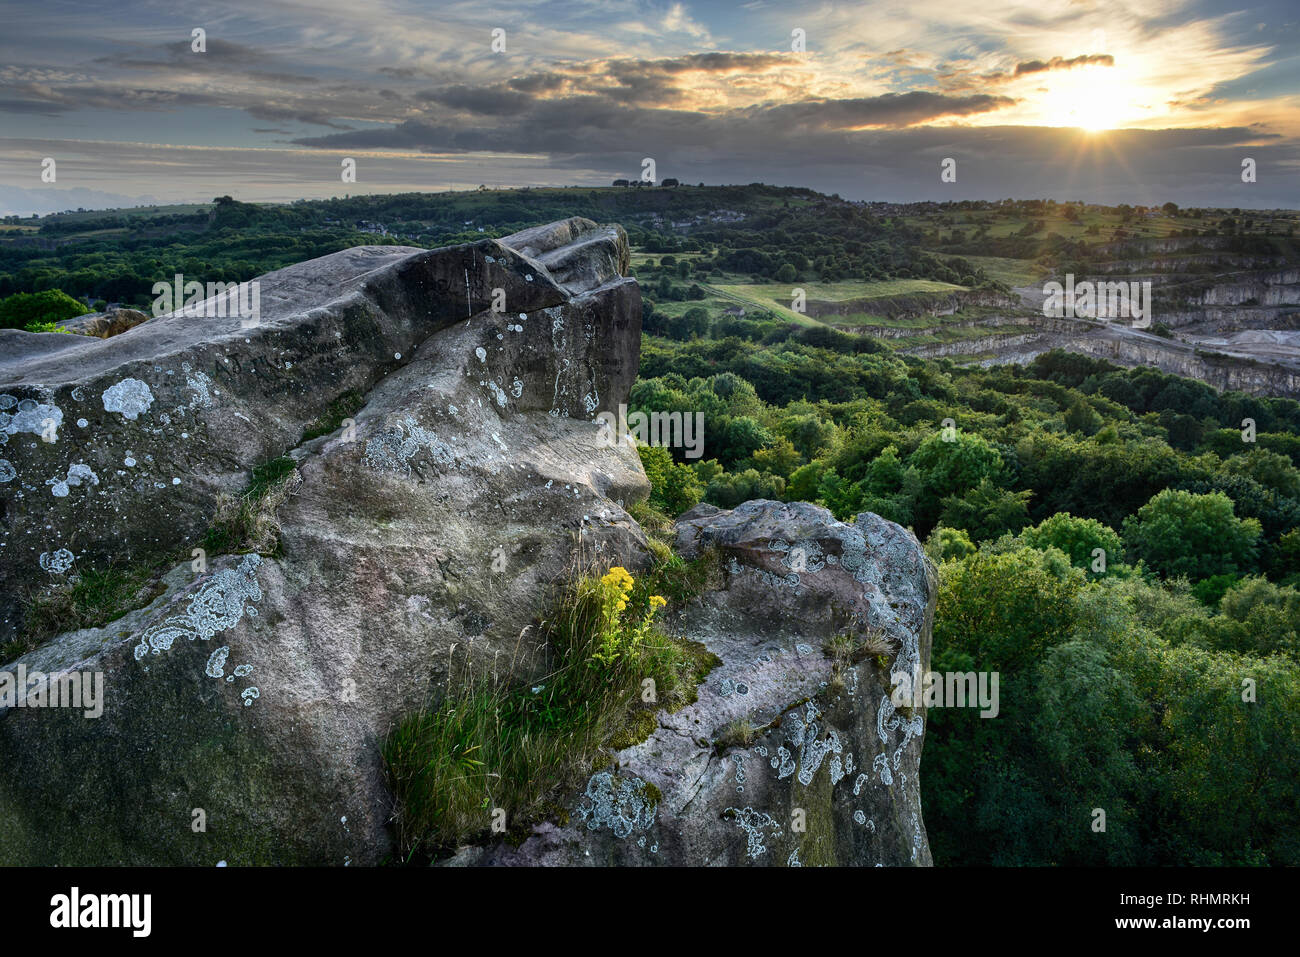 Black Rocks at sunset - Stock Image